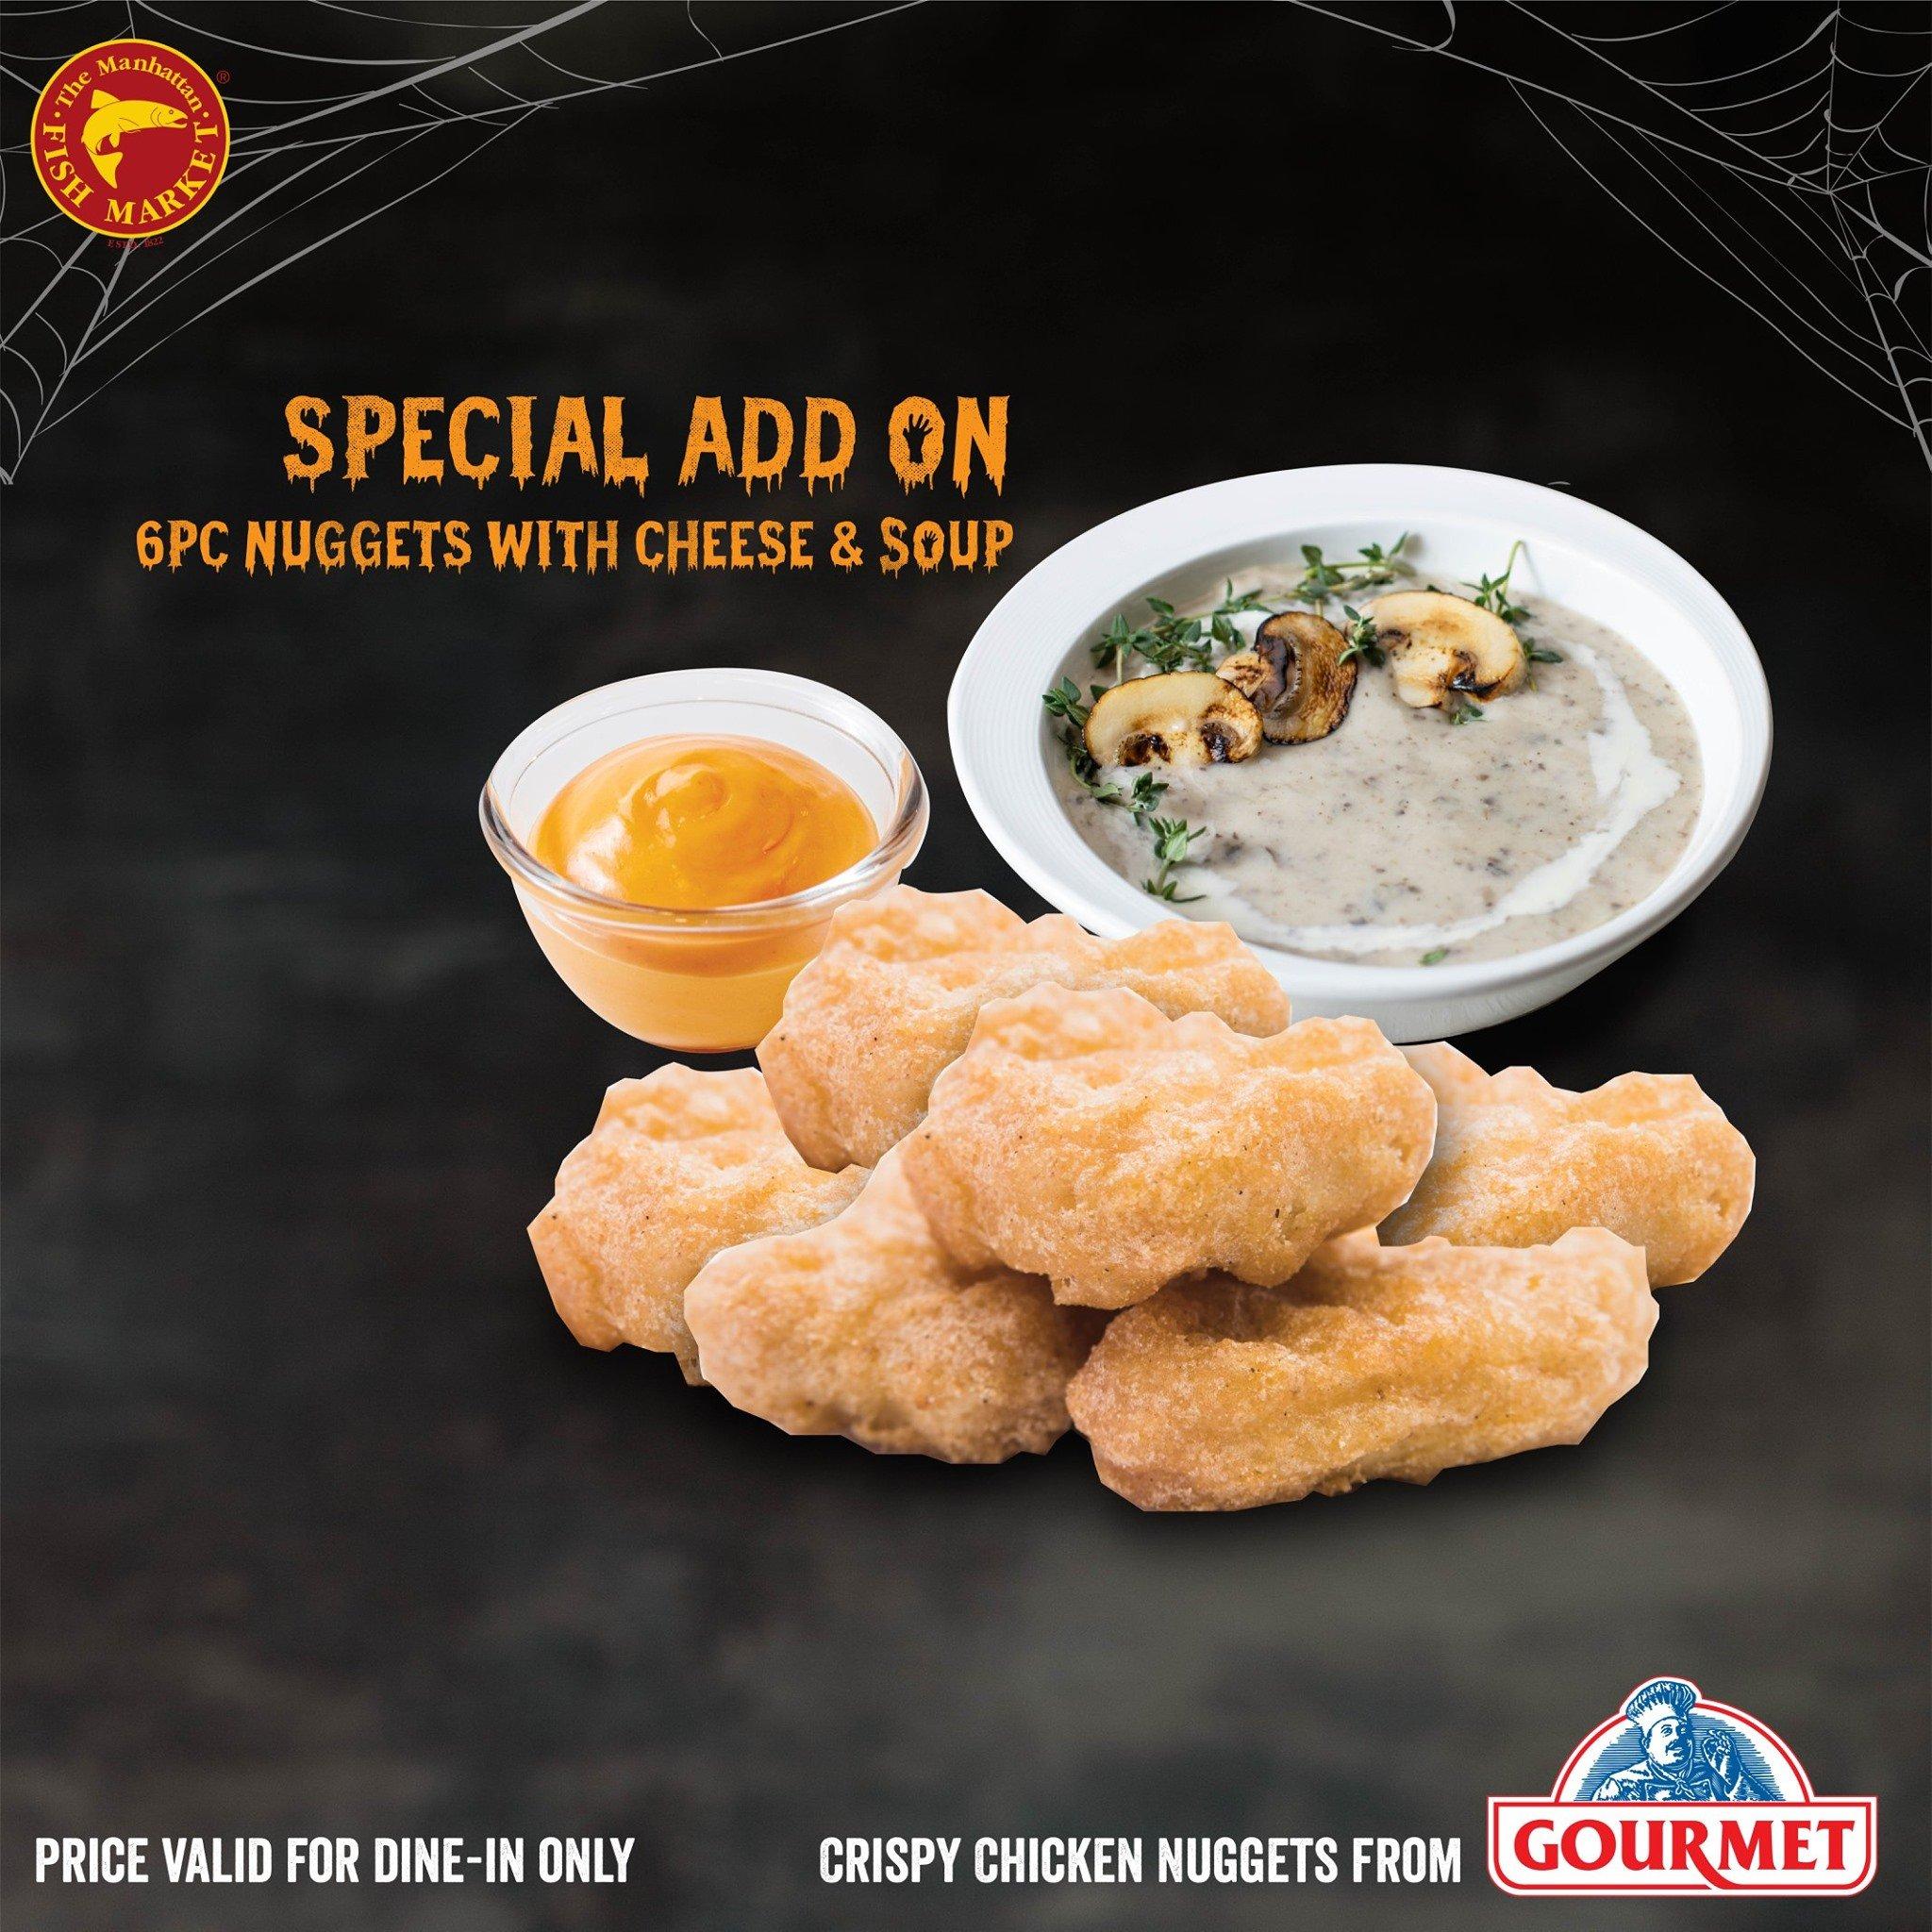 manhattan monster burger promotion nuggets